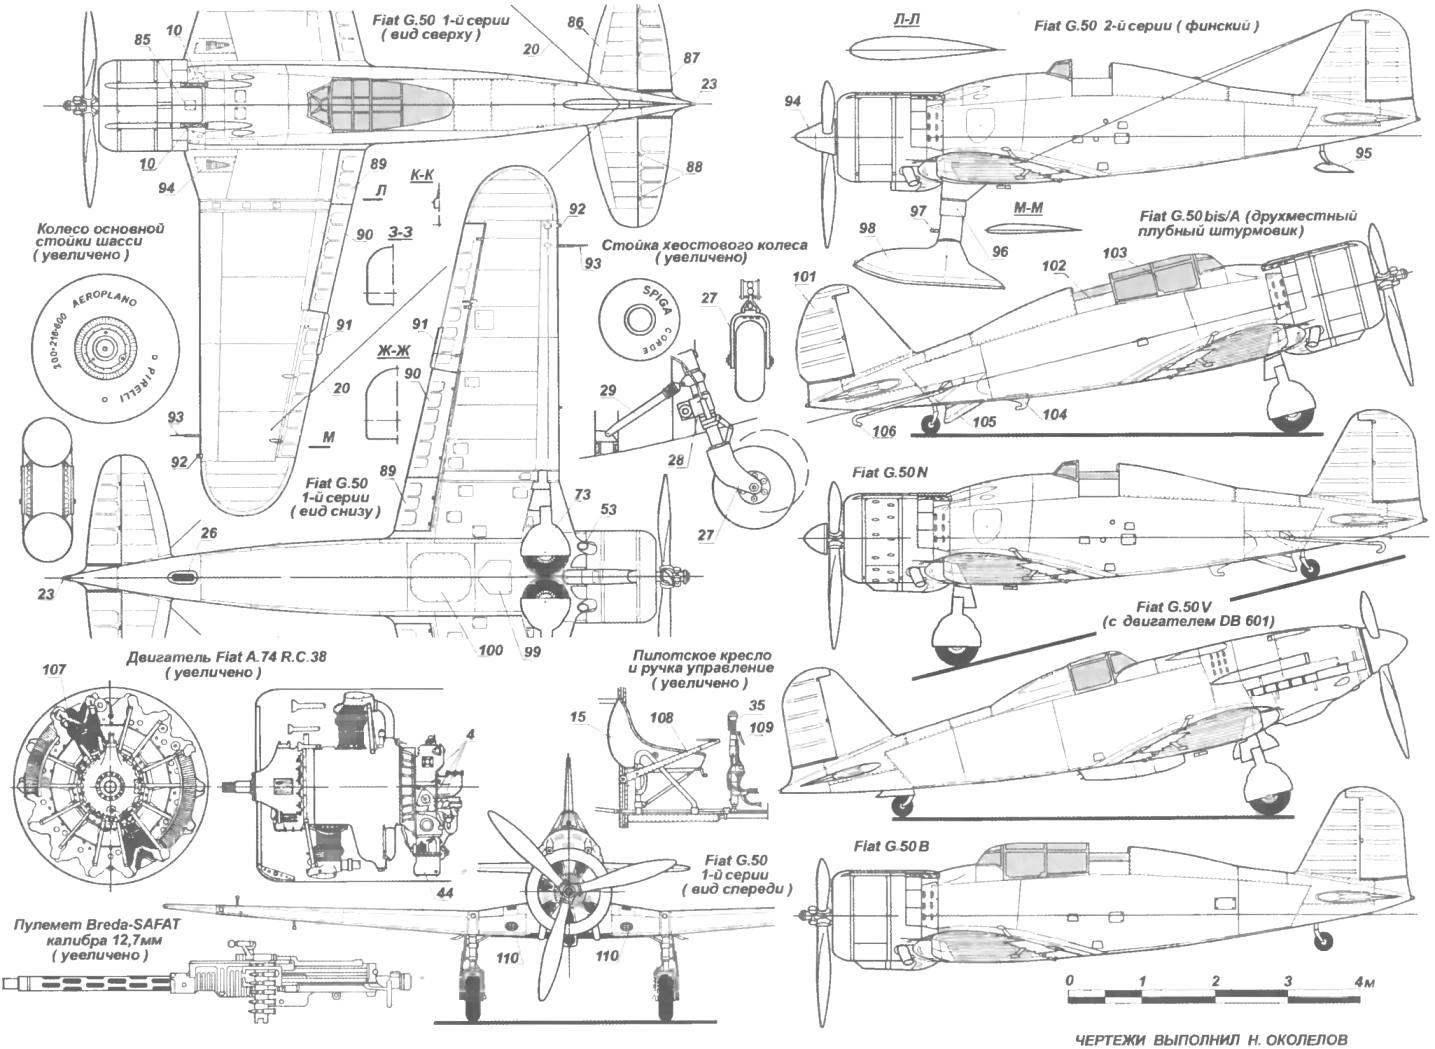 The Italian fighter FIAT G. 50